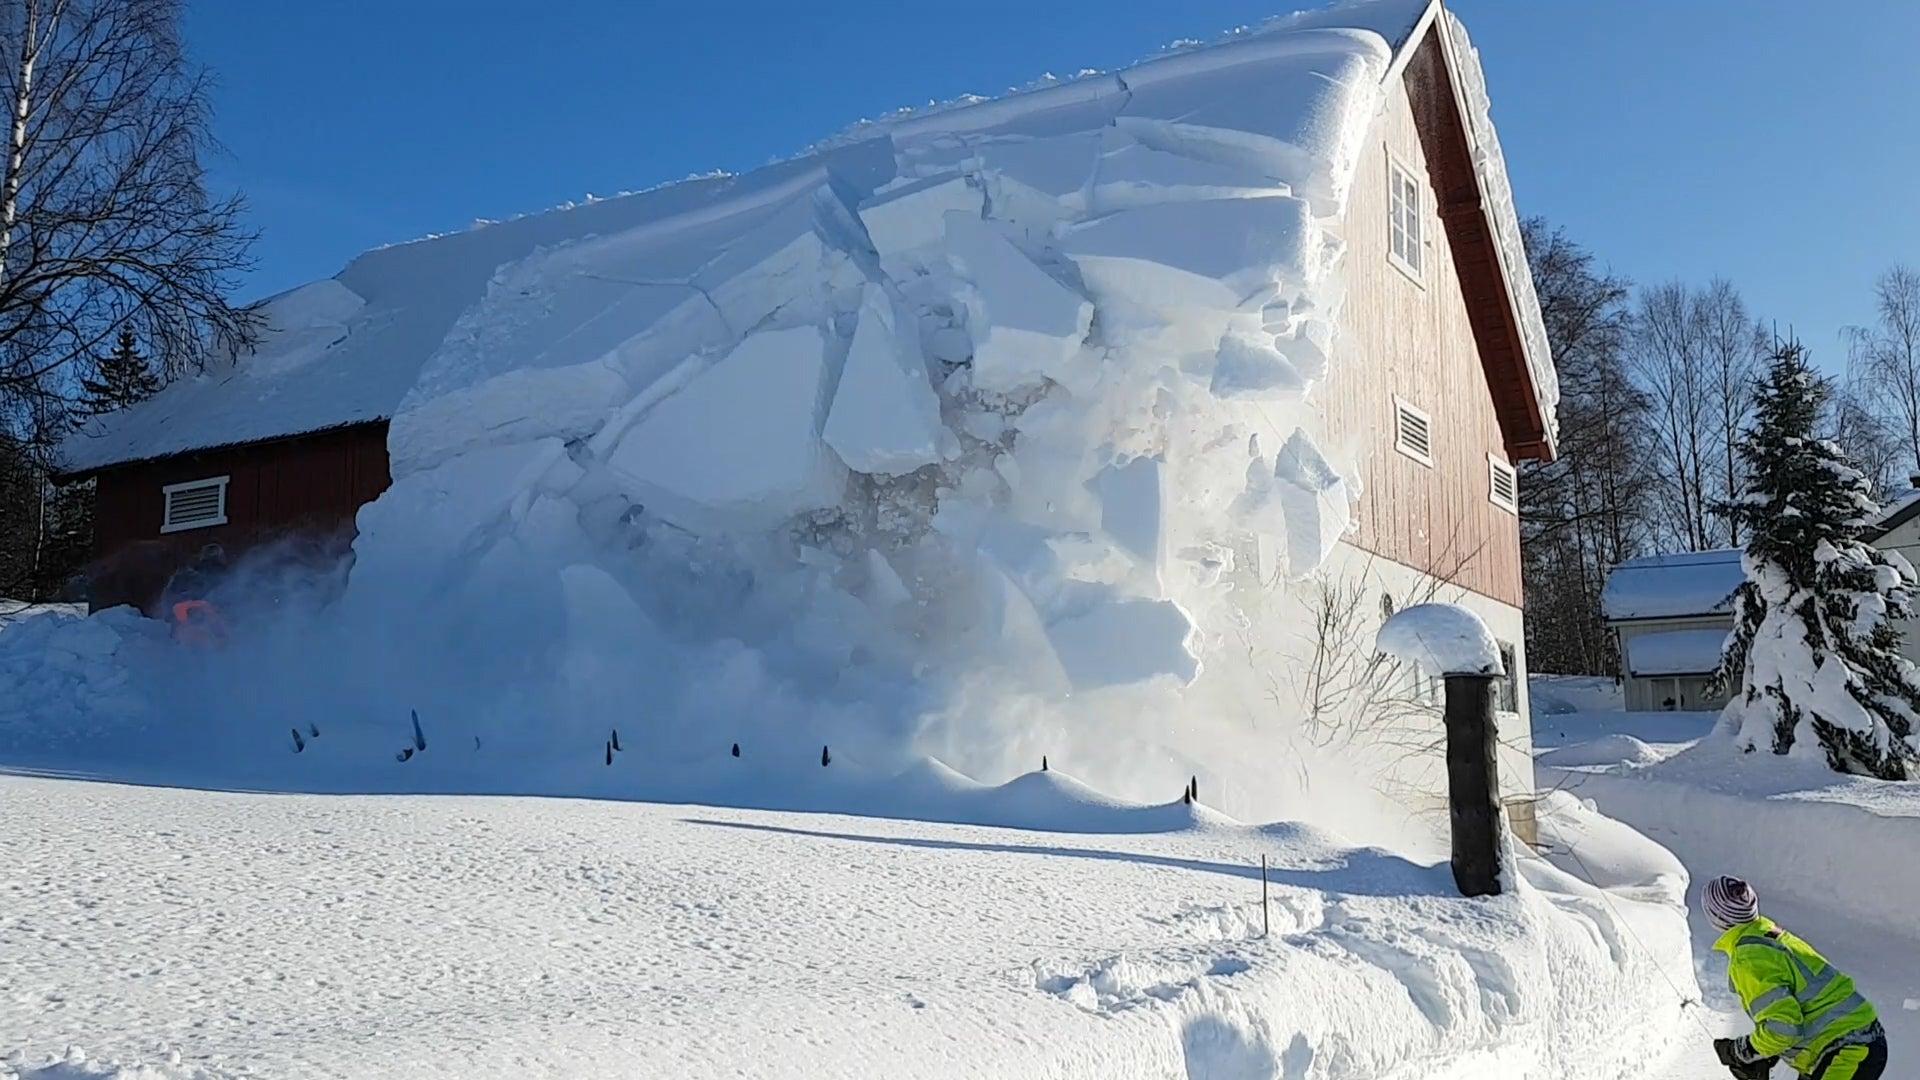 Norwegian Family S Snow Removal Method Is So Satisfying